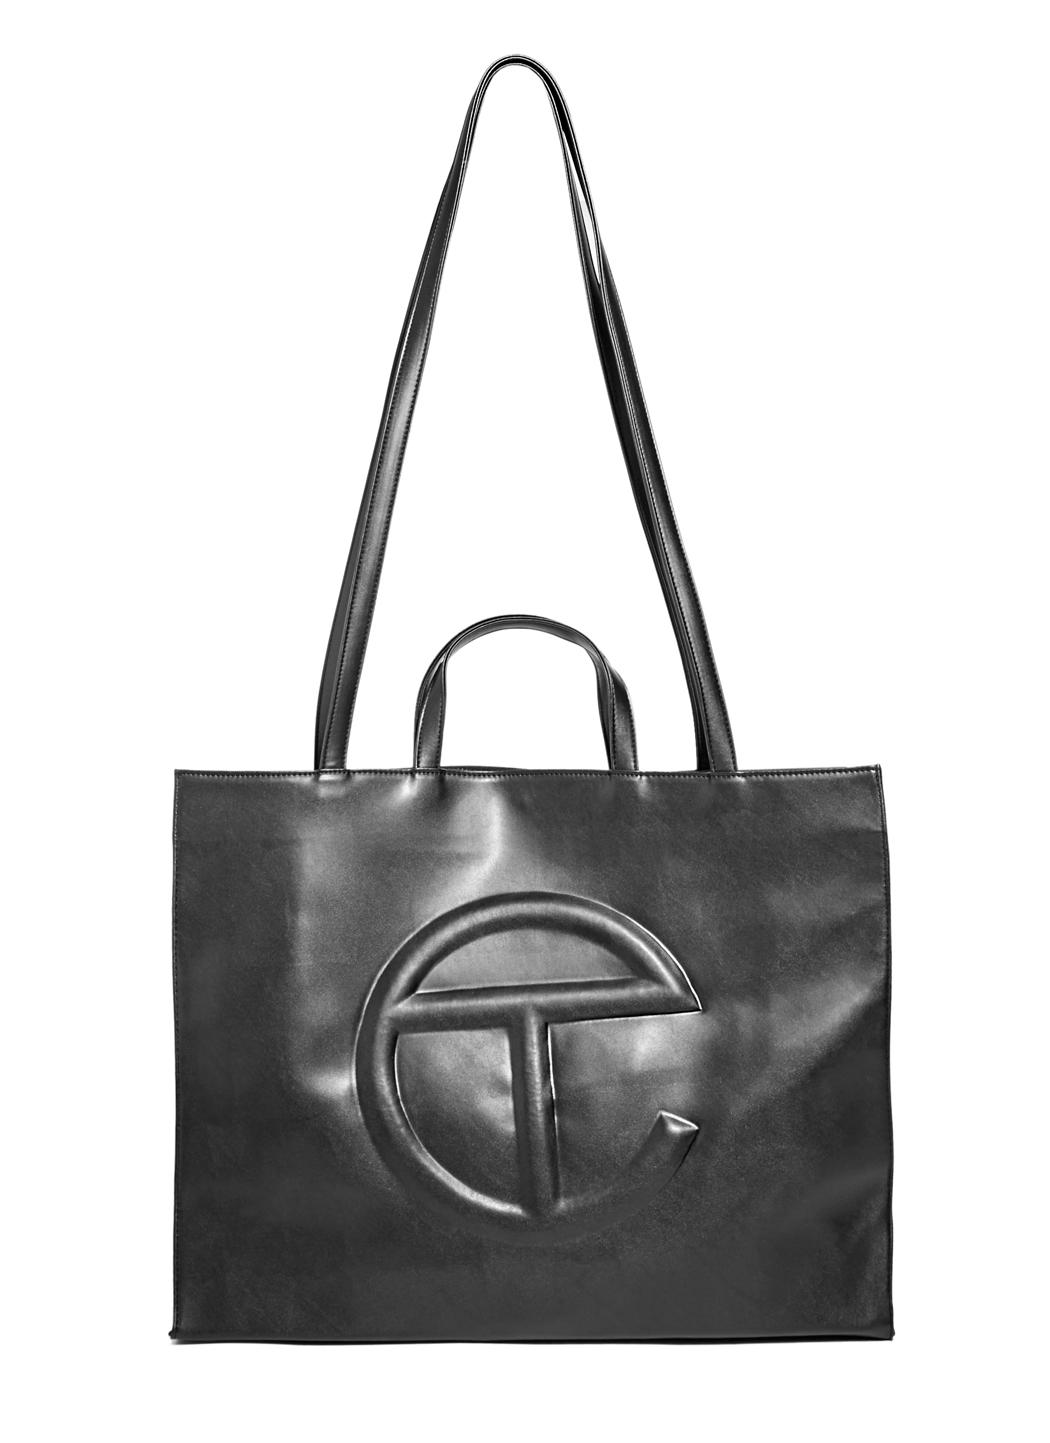 Lyst Telfar Large Pu Leather Tote Bag In Black